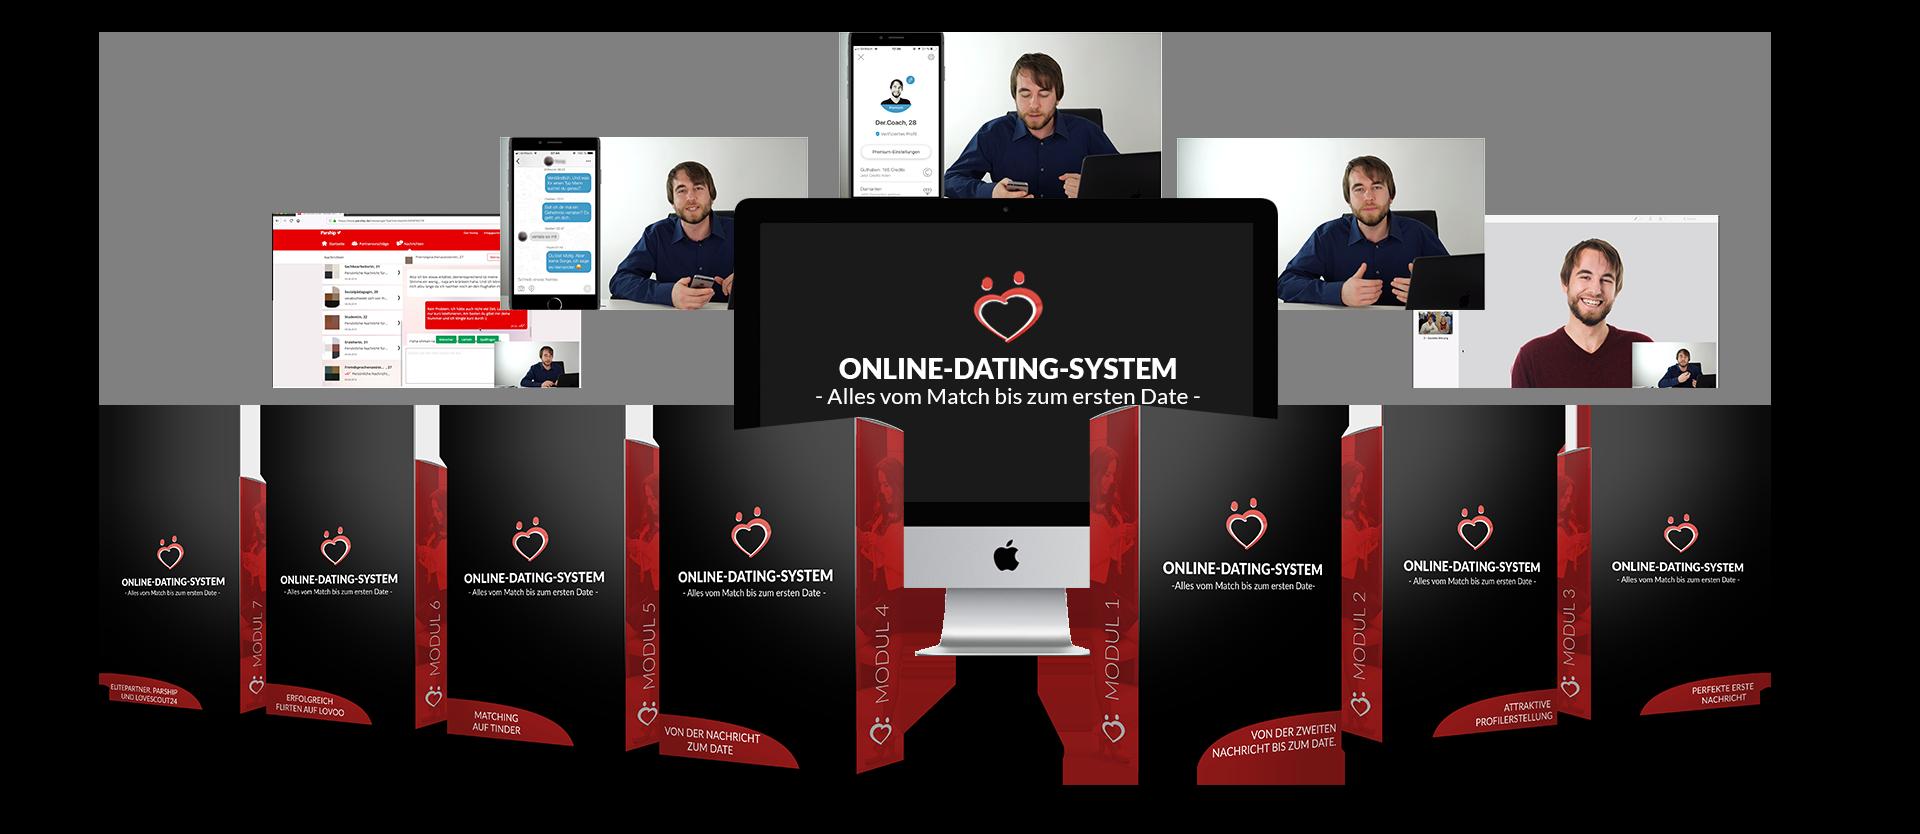 online-dating-system